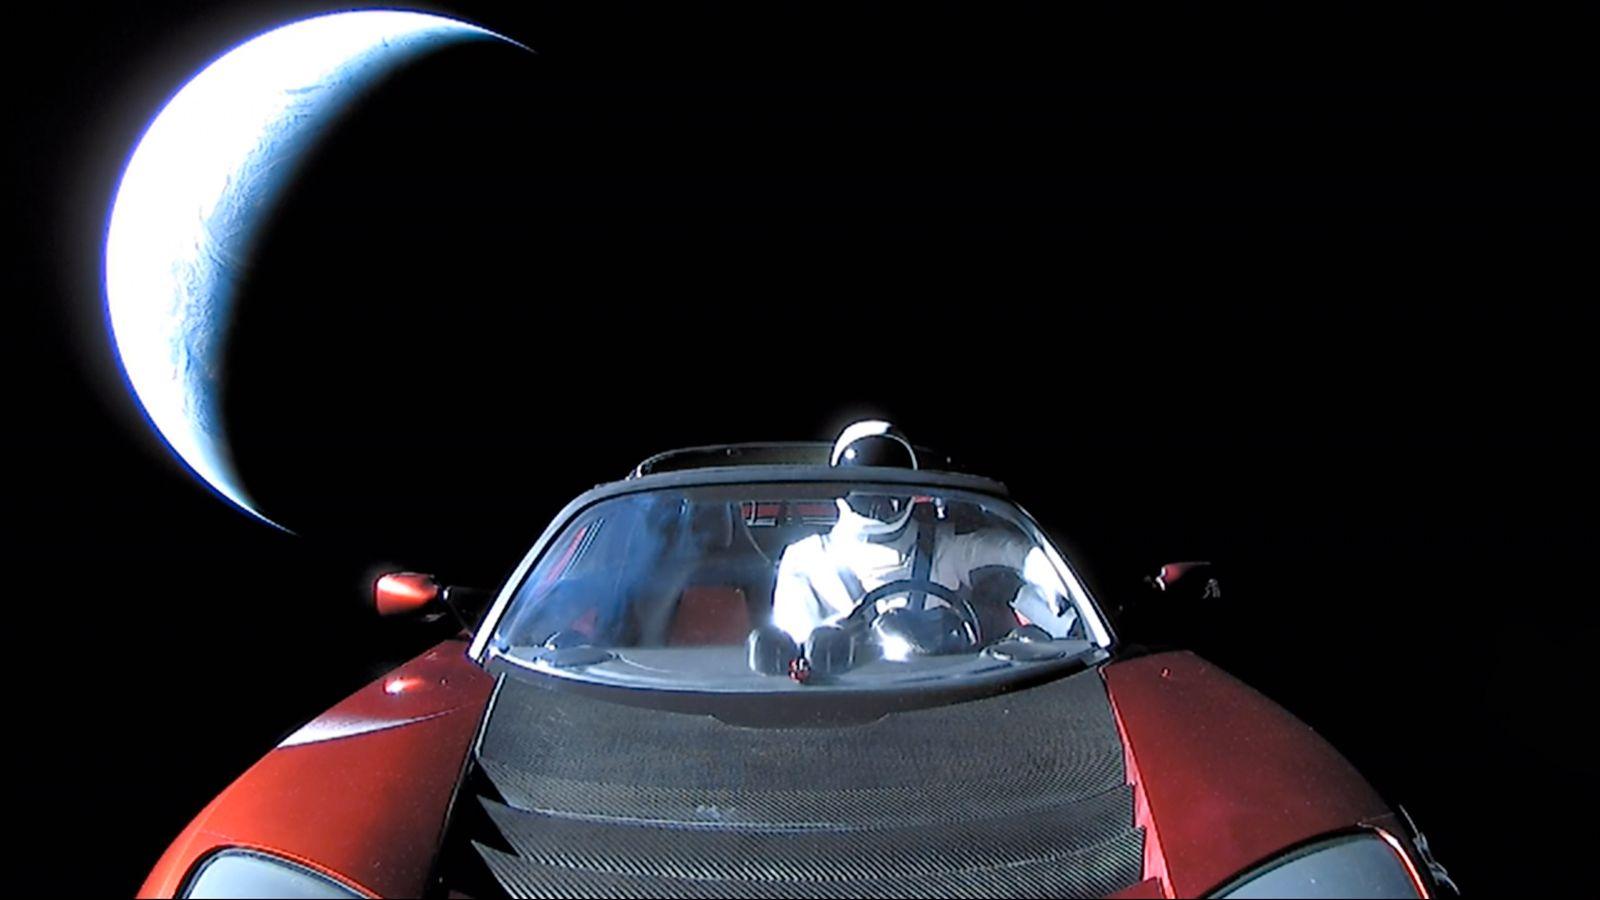 SpaceX / Tesla Roadster